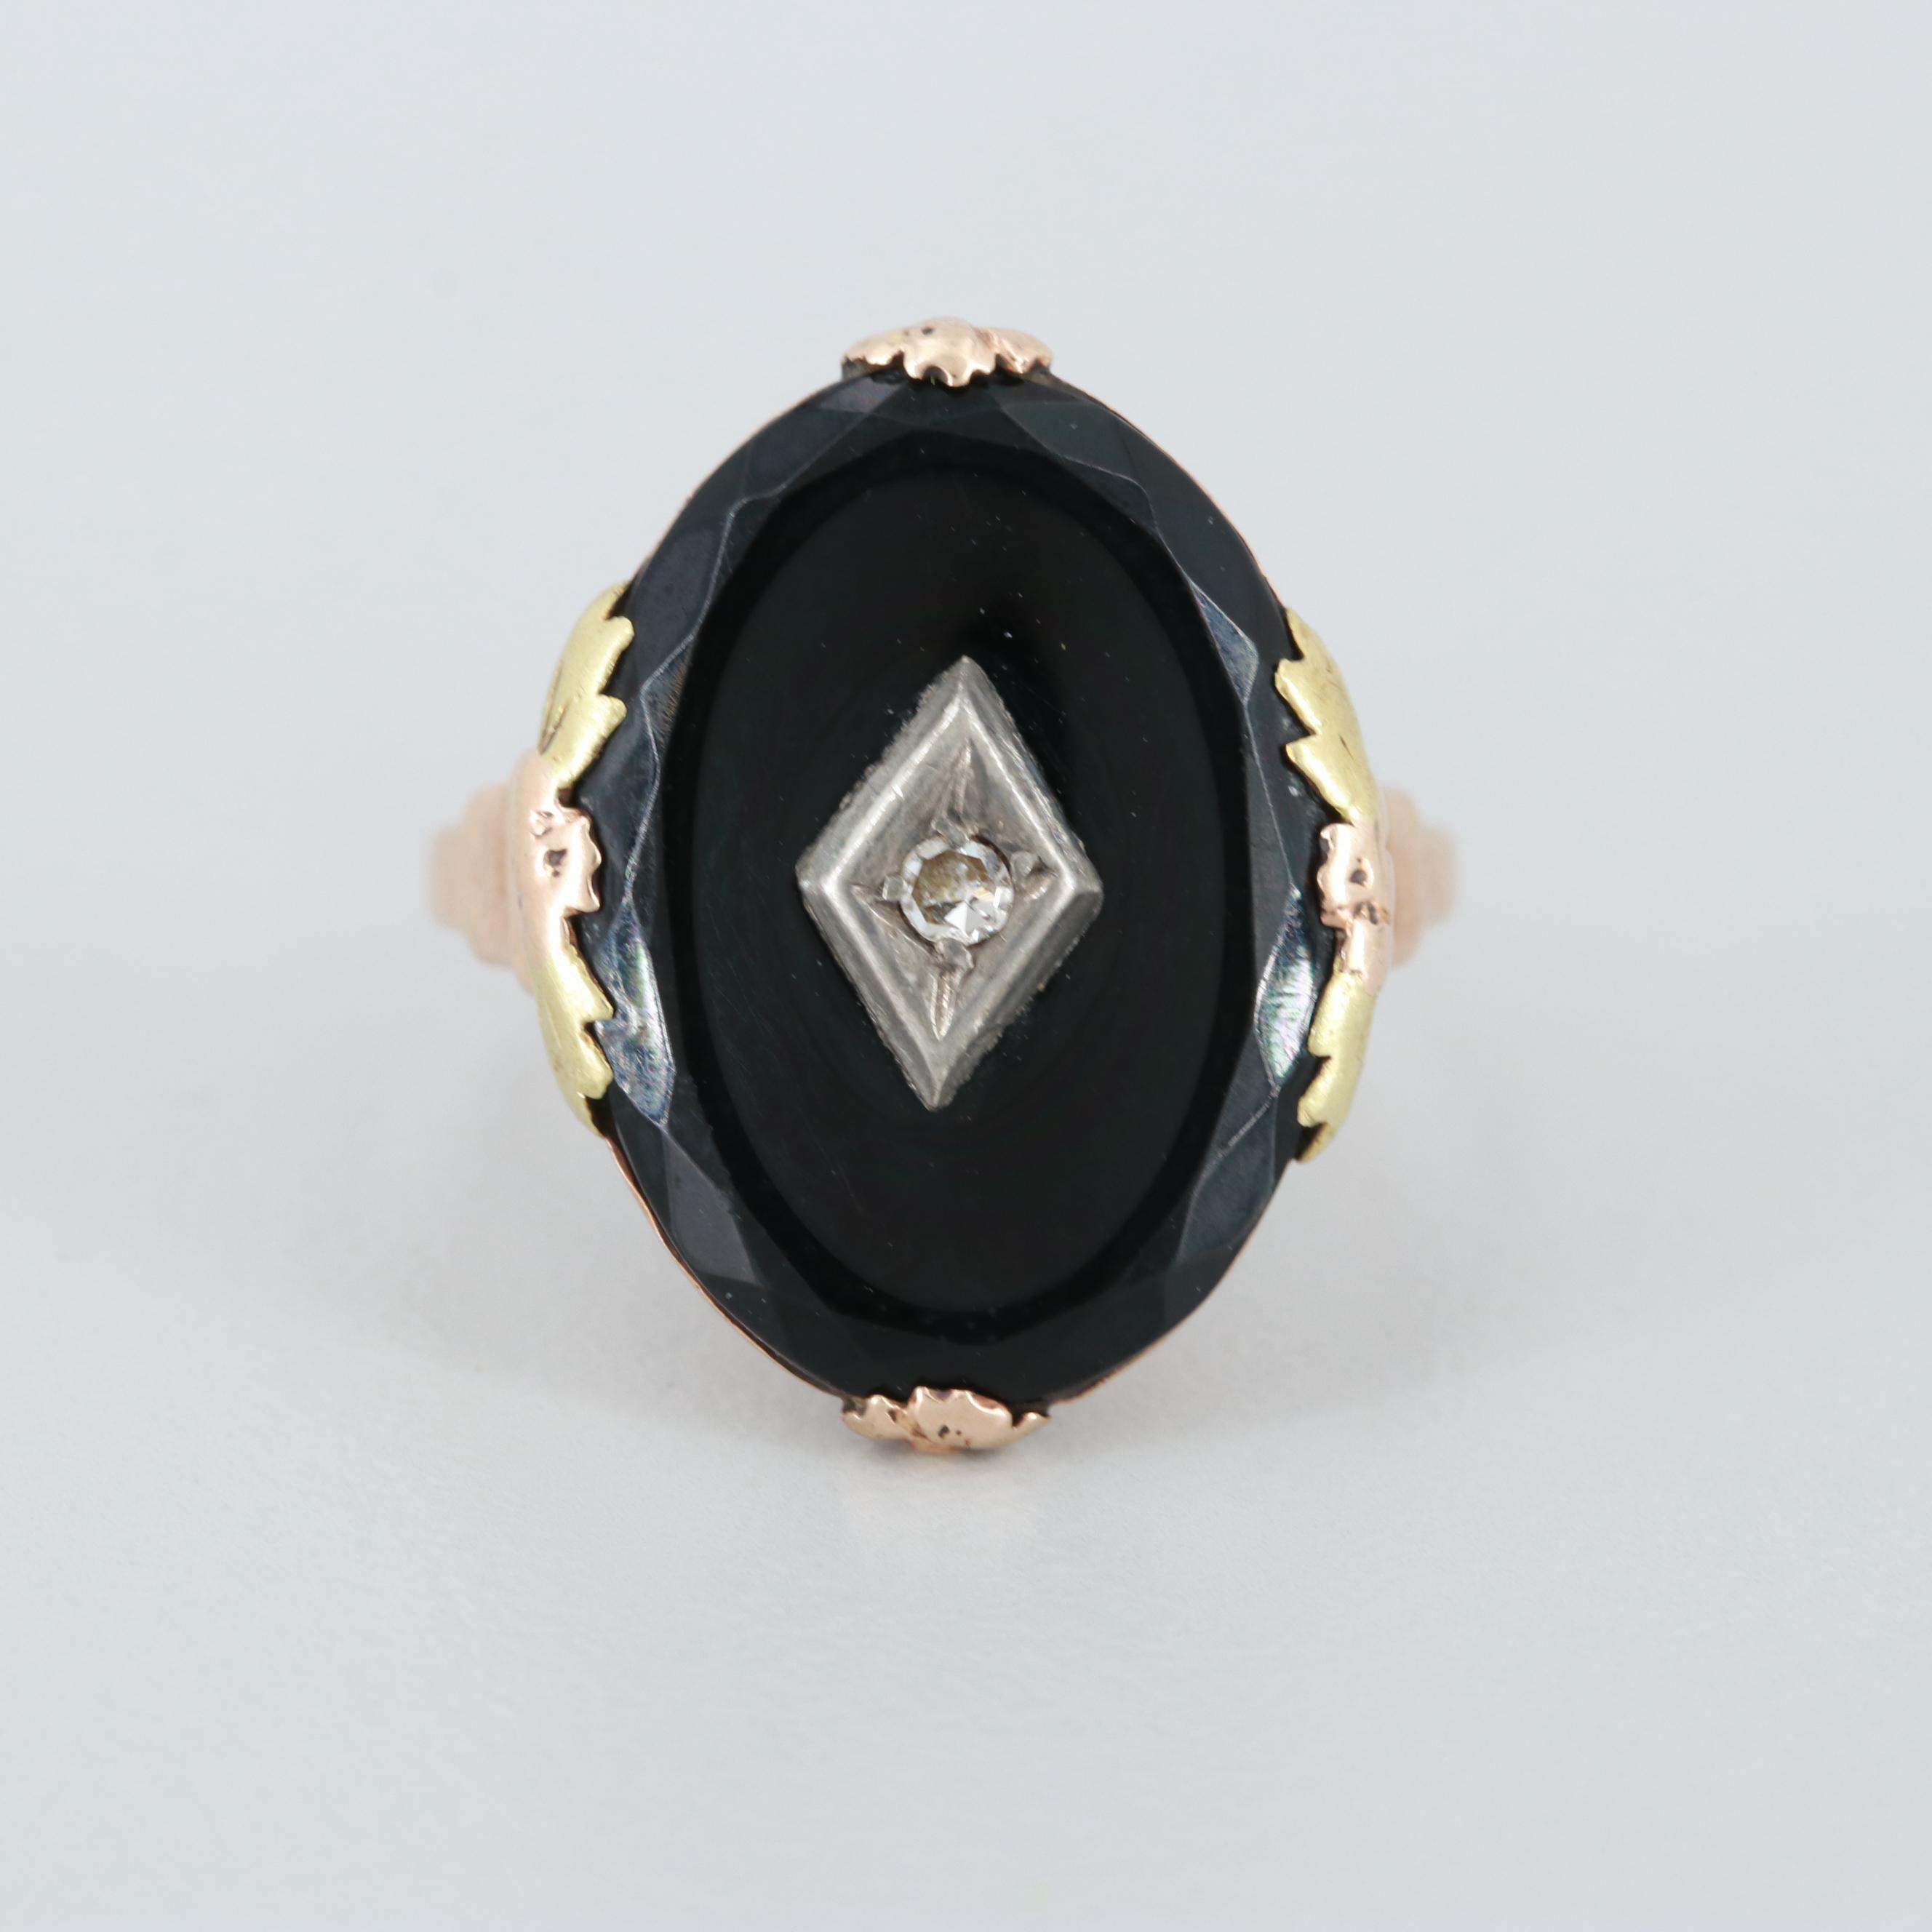 Vintage 10K Yellow Gold Black Onyx and Diamond Ring